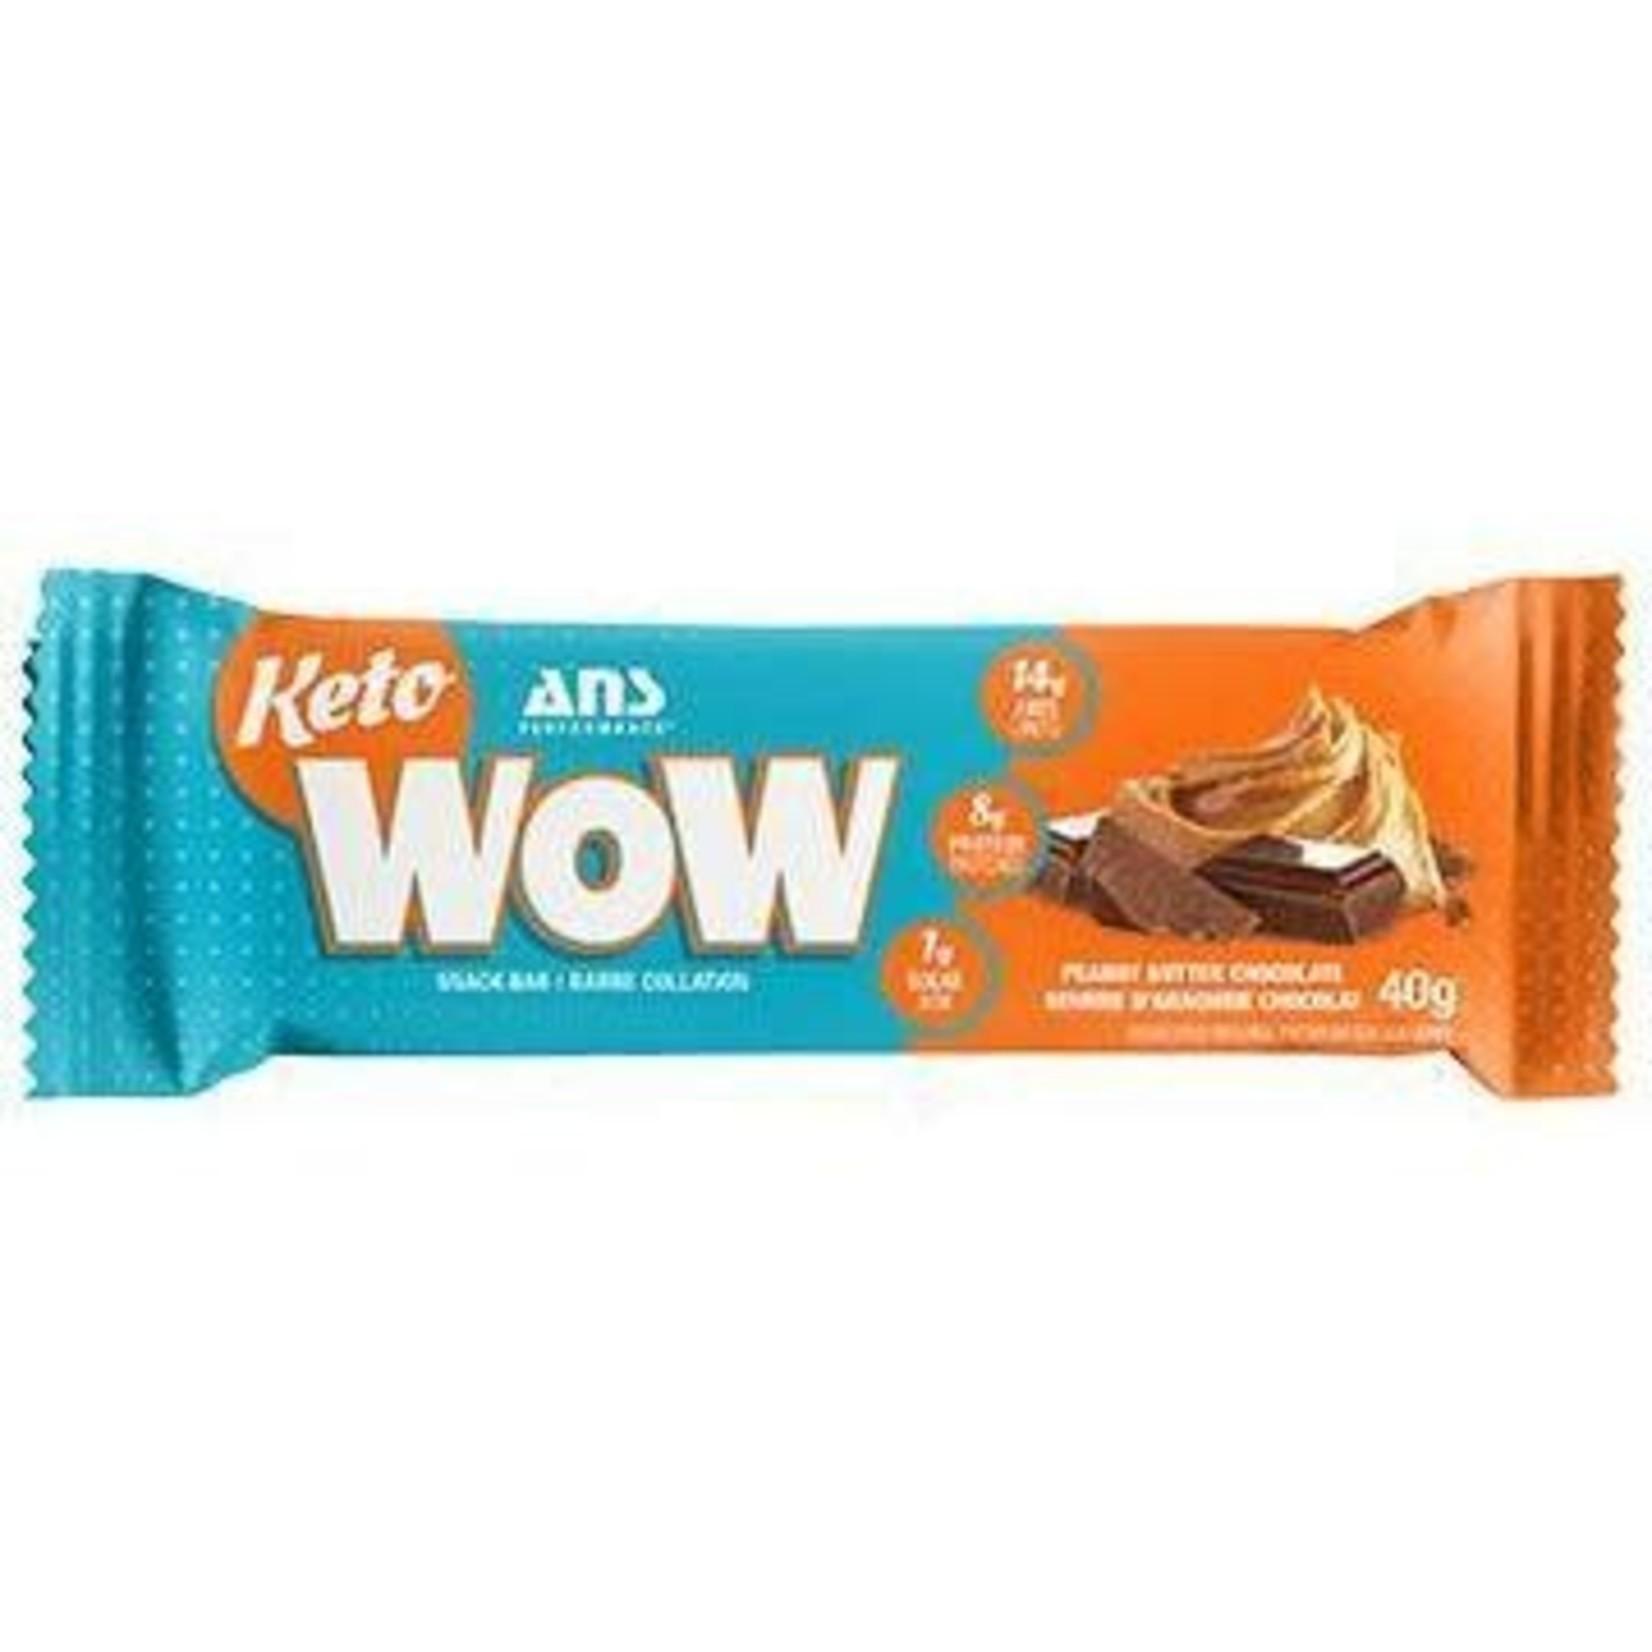 ANS ANS Keto WOW Peanut Butter Chocolate Bar